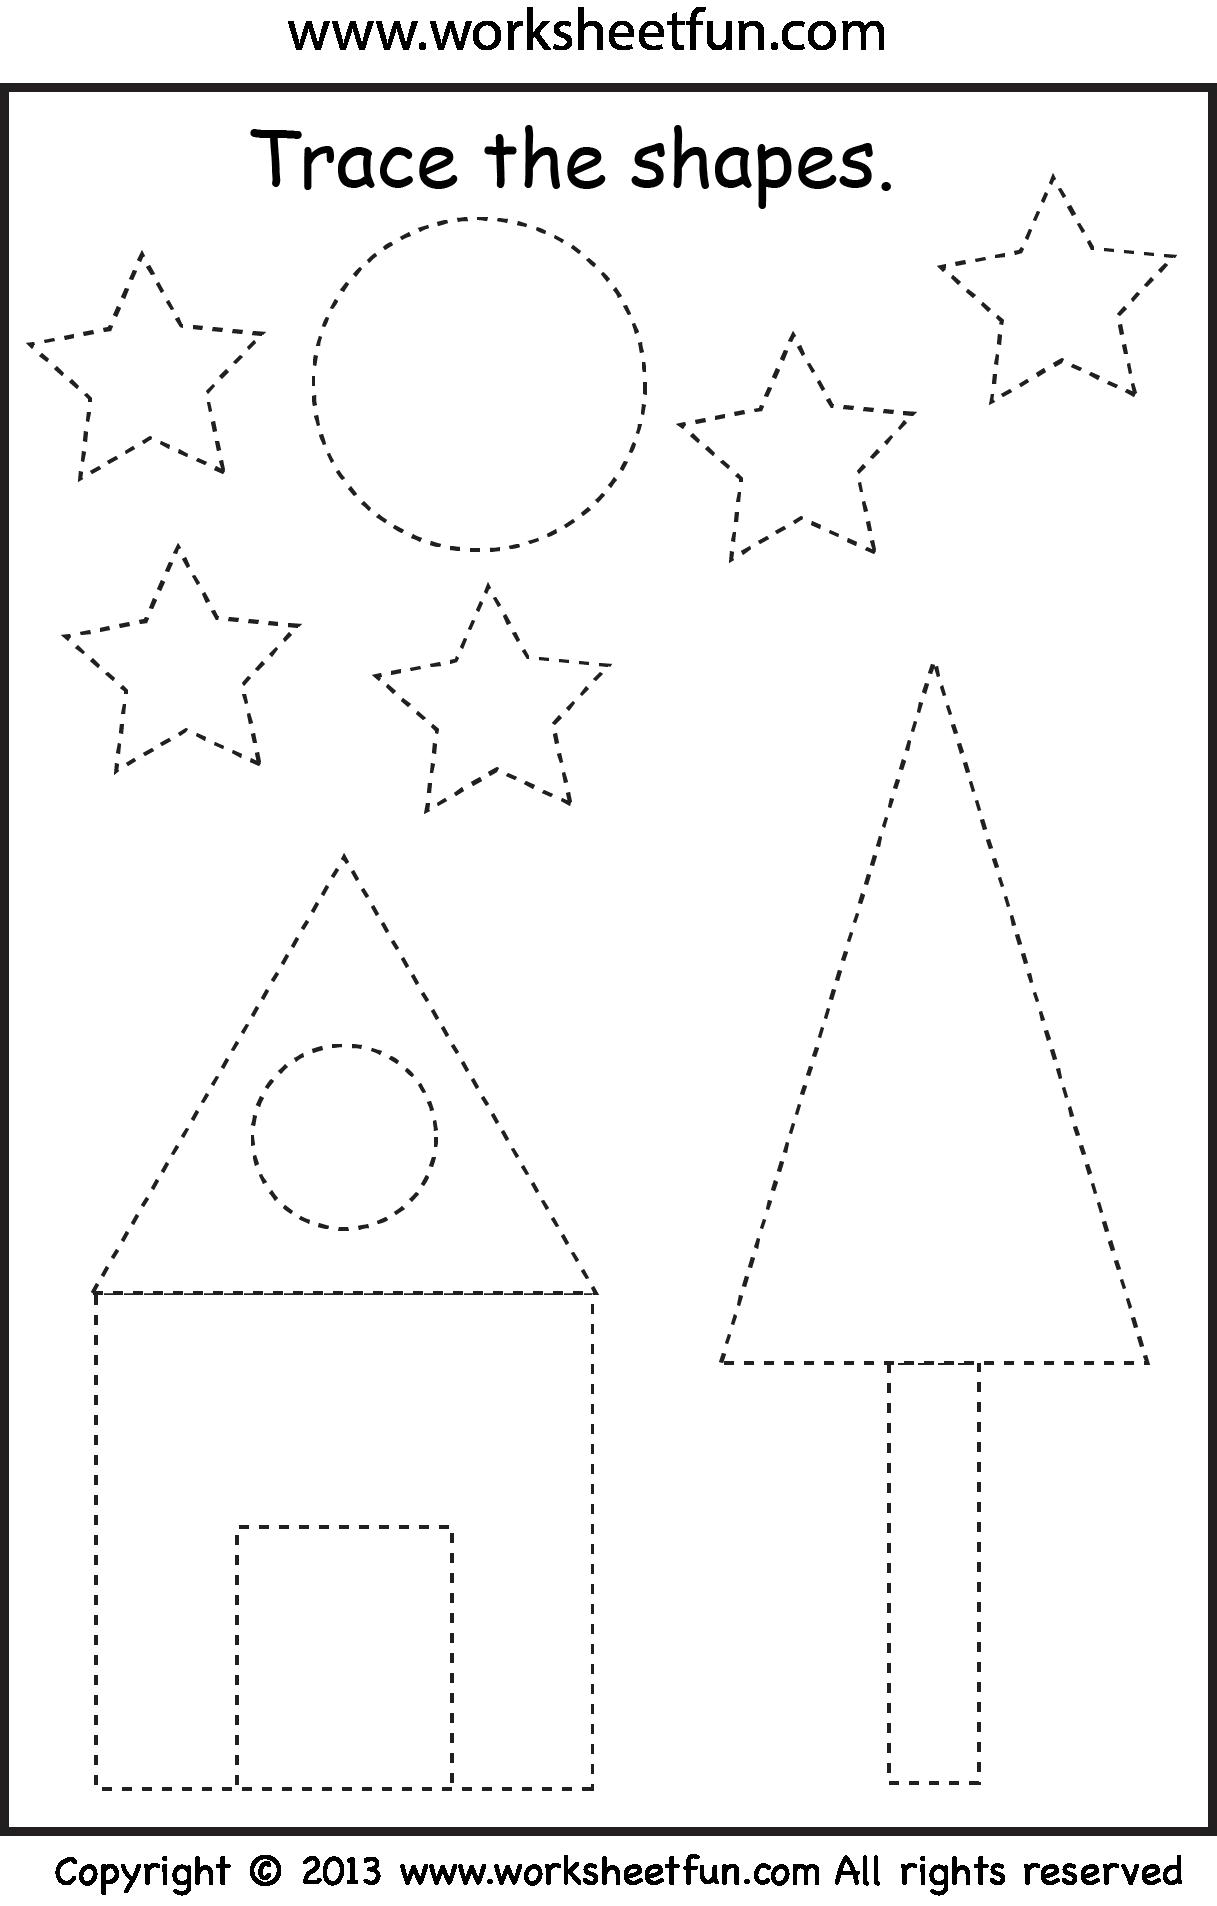 preschool shape tracing worksheet pinterest more preschool shapes tracing worksheets and. Black Bedroom Furniture Sets. Home Design Ideas